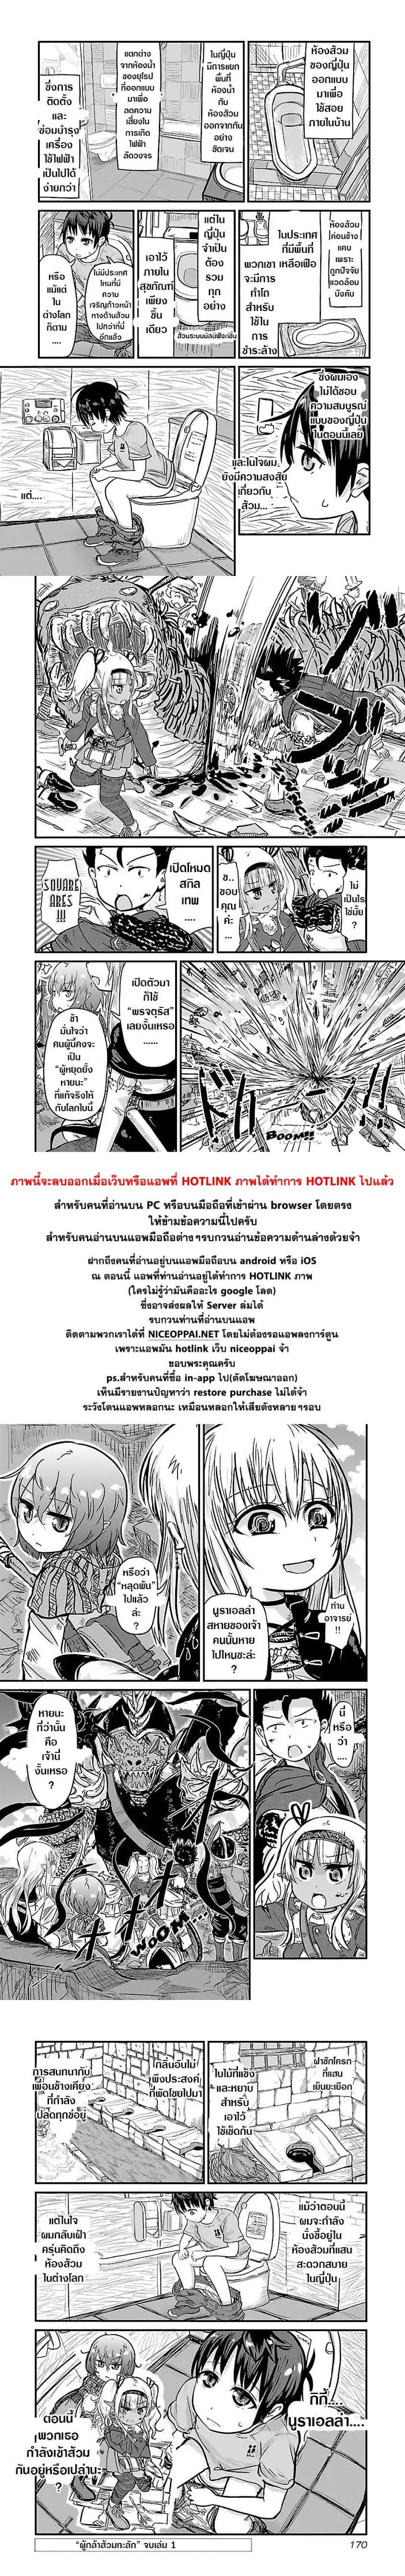 Isekai no Toire de Dai o suru ตอนที่ 18 TH แปลไทย